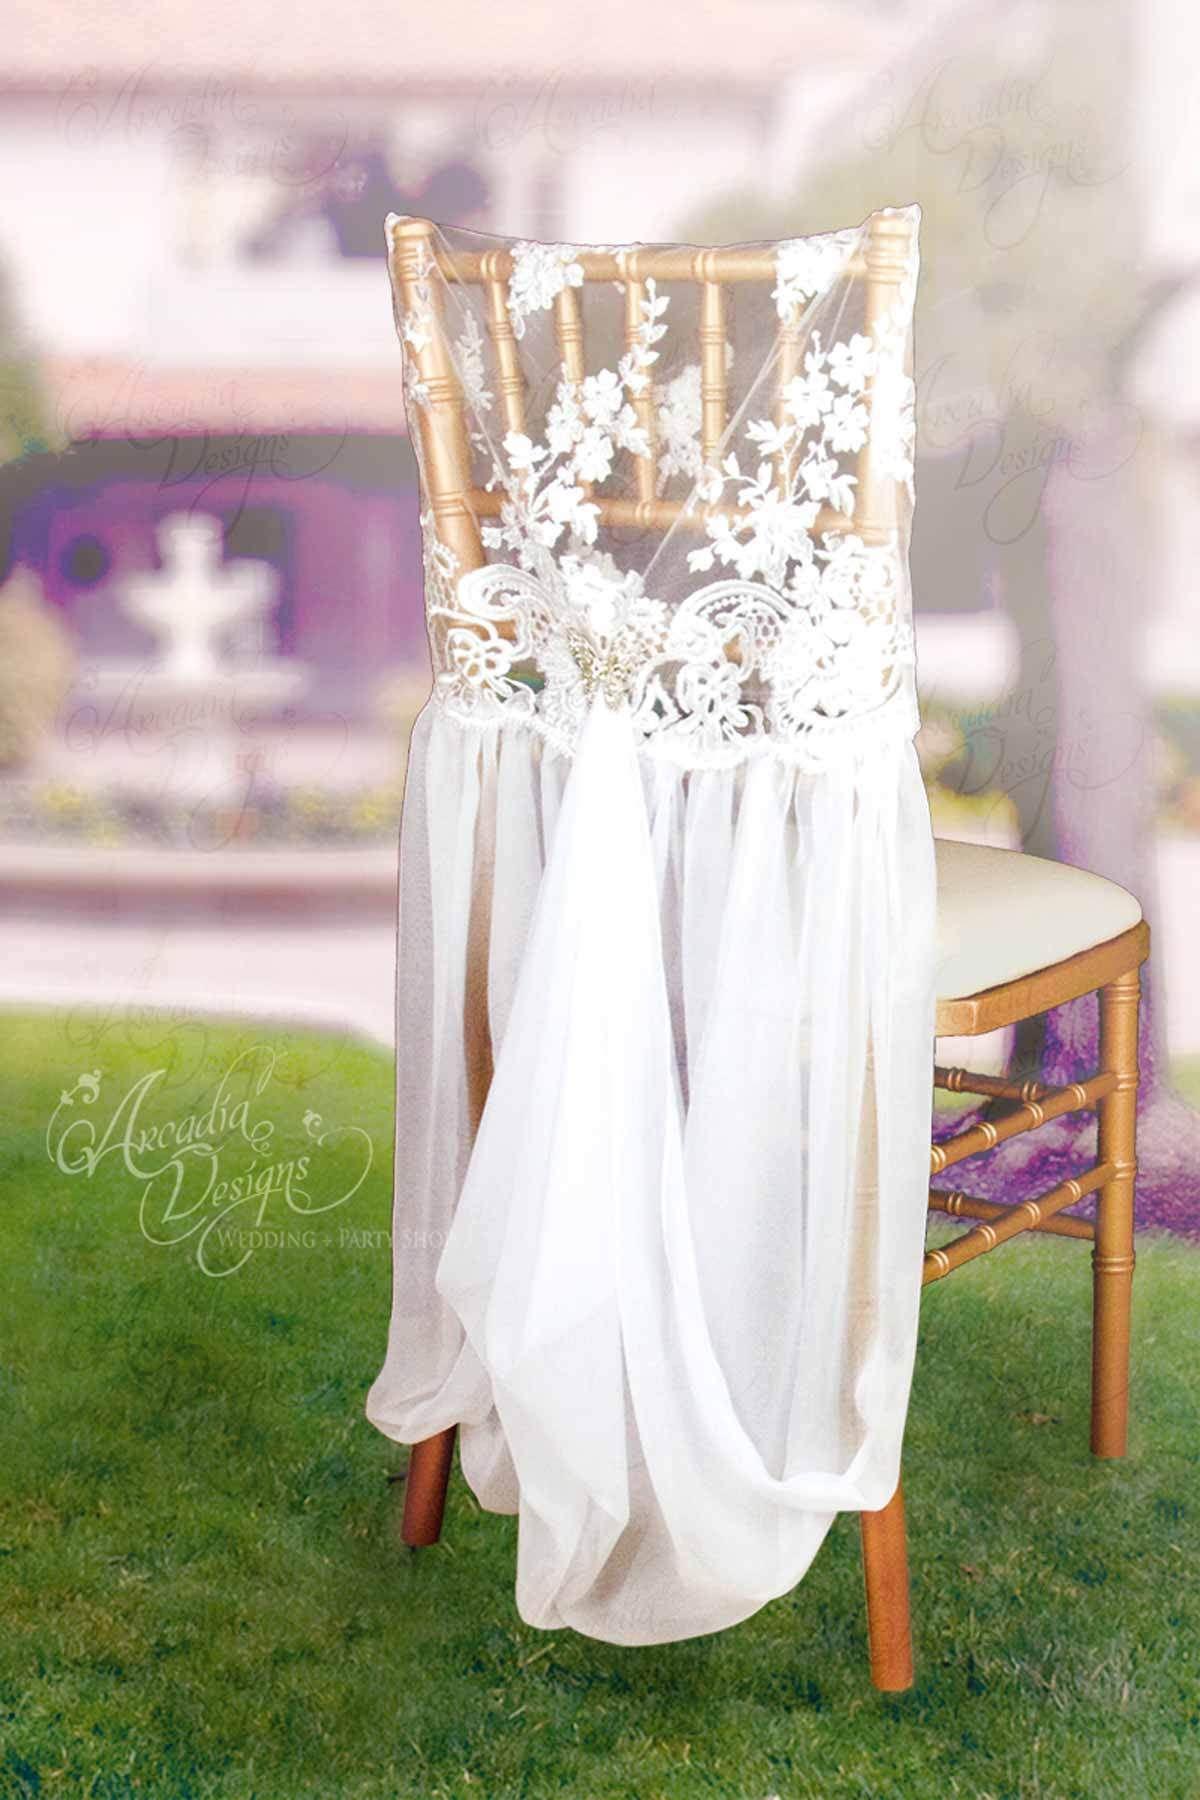 Wedding chair decorations diy  Lace Chair Cover with Chiffon Drape  decoracion de sillas